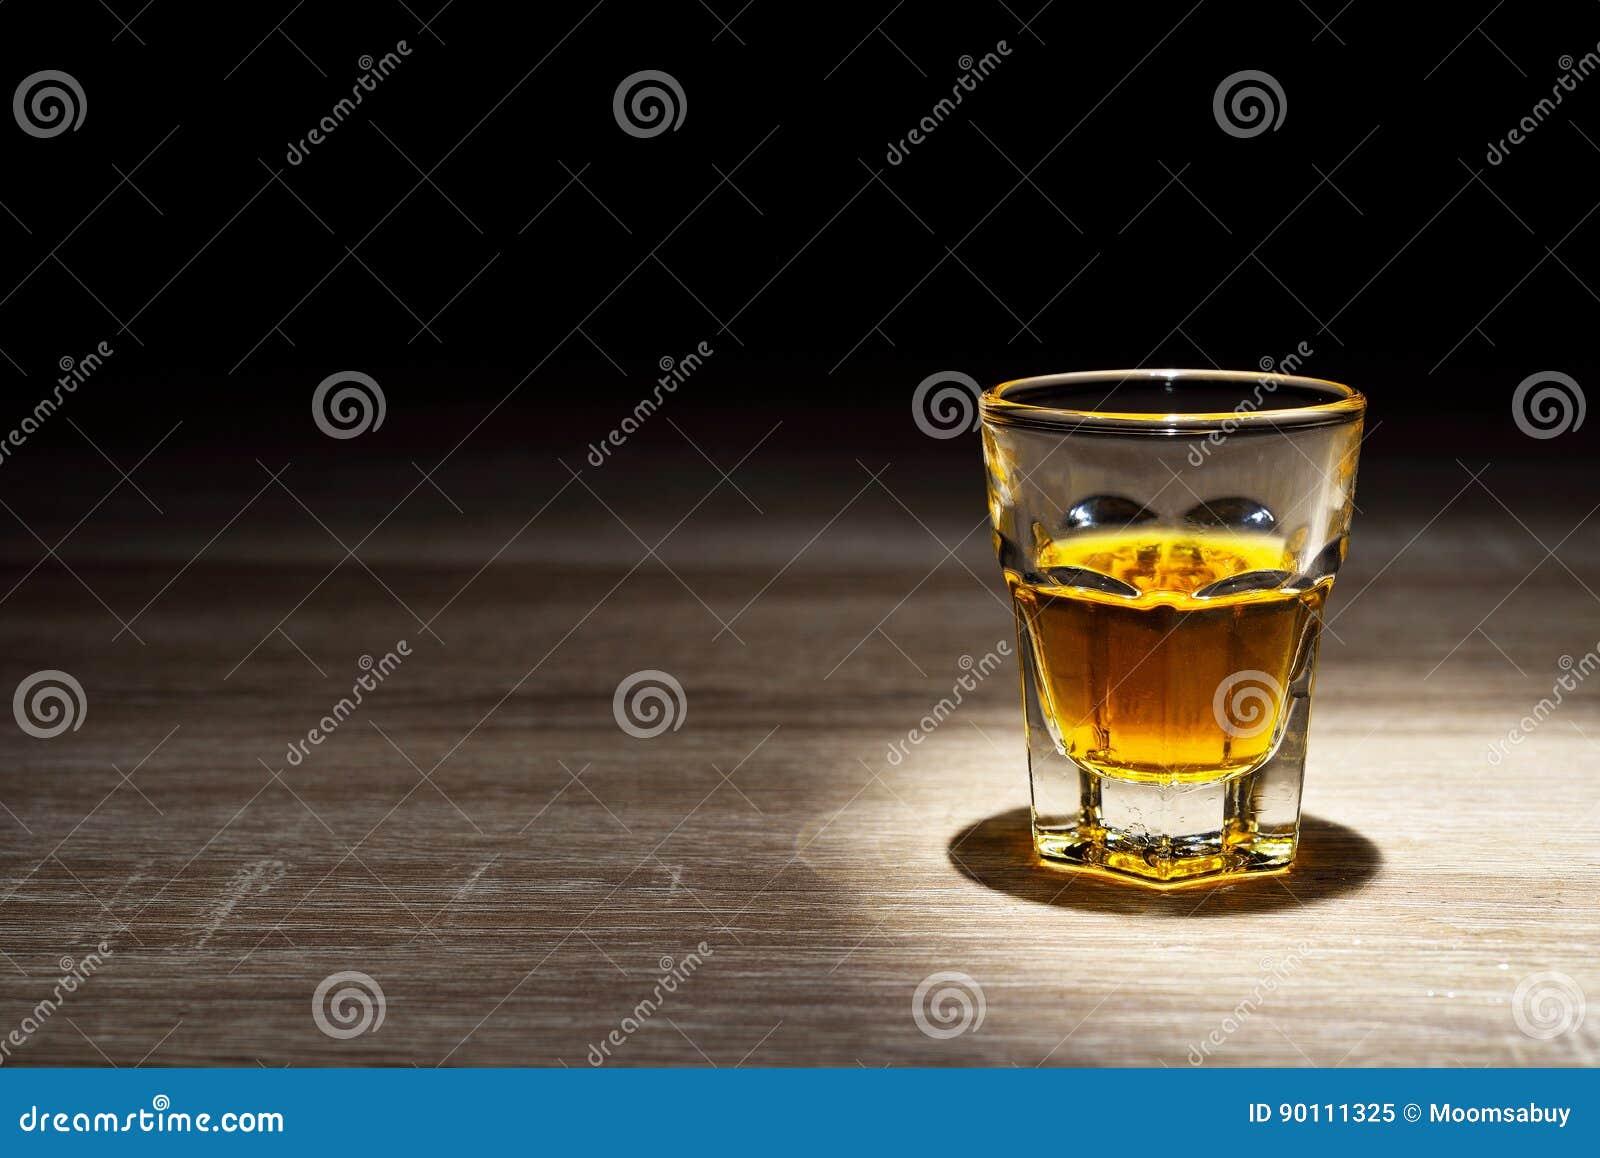 Whisky Shot Drinks Alcohol Shots Scotch And Alcohol Alcoholic